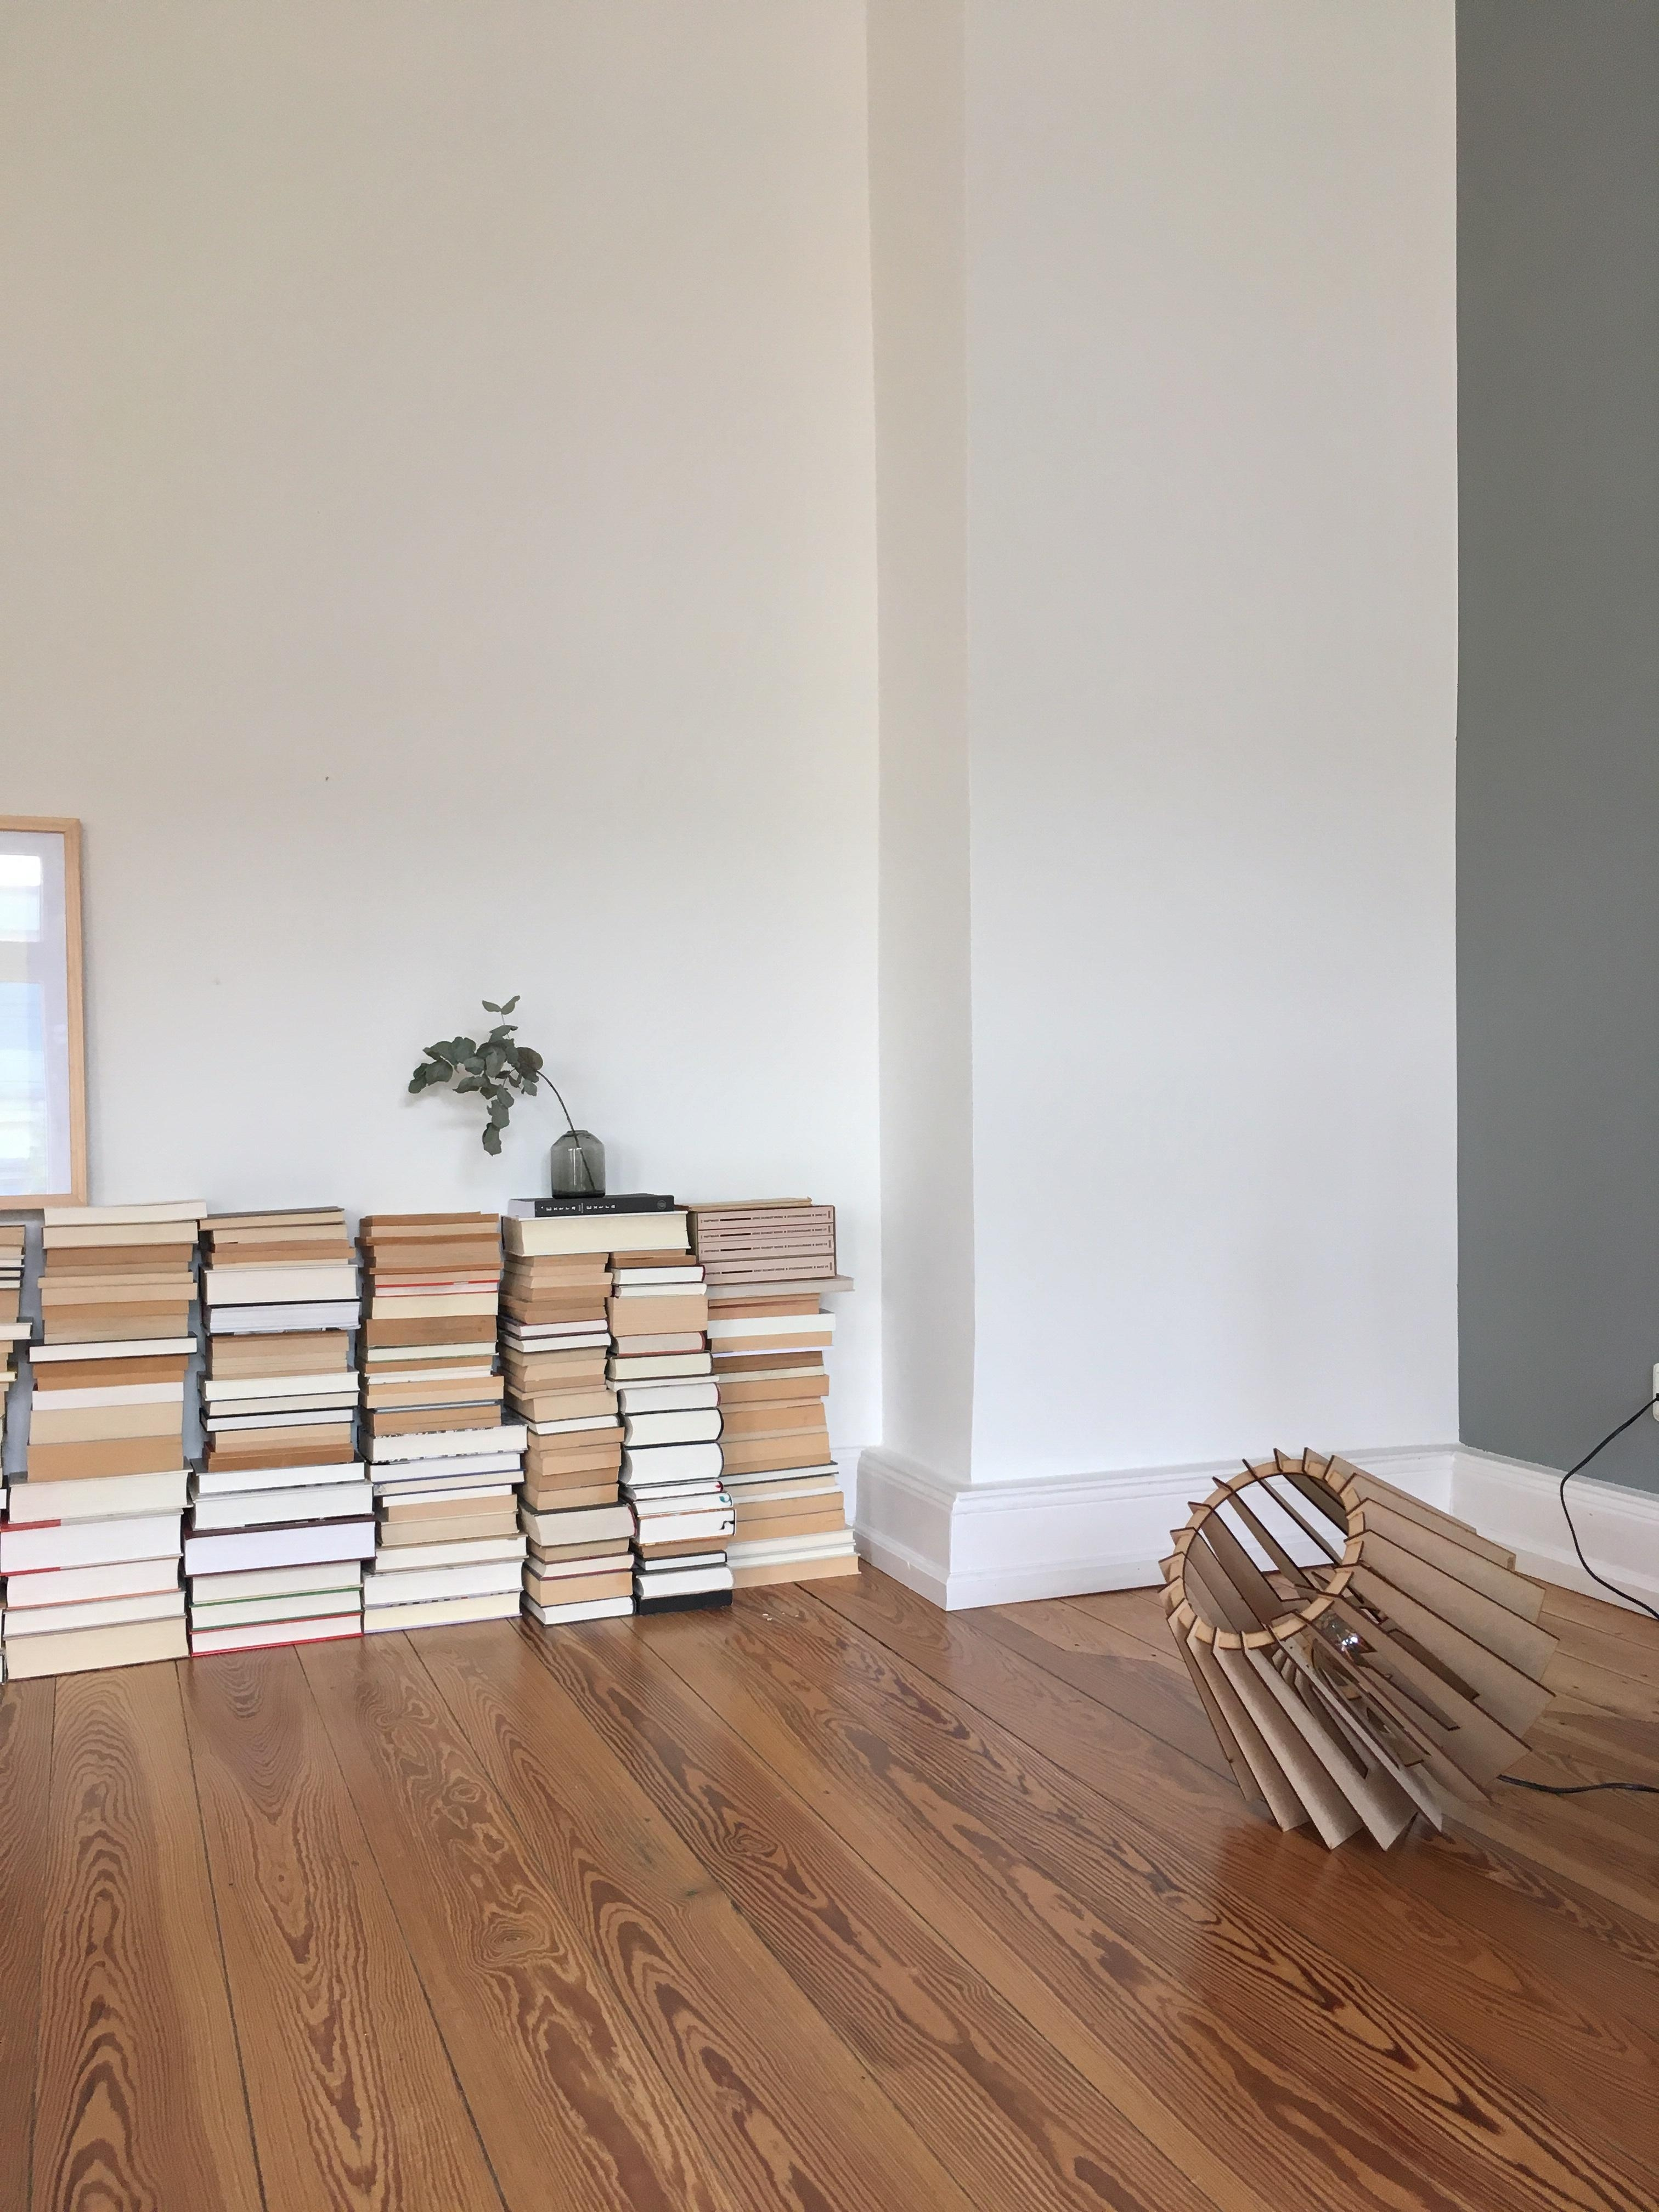 b cherregal mal anders regal b cher b cherwand a. Black Bedroom Furniture Sets. Home Design Ideas